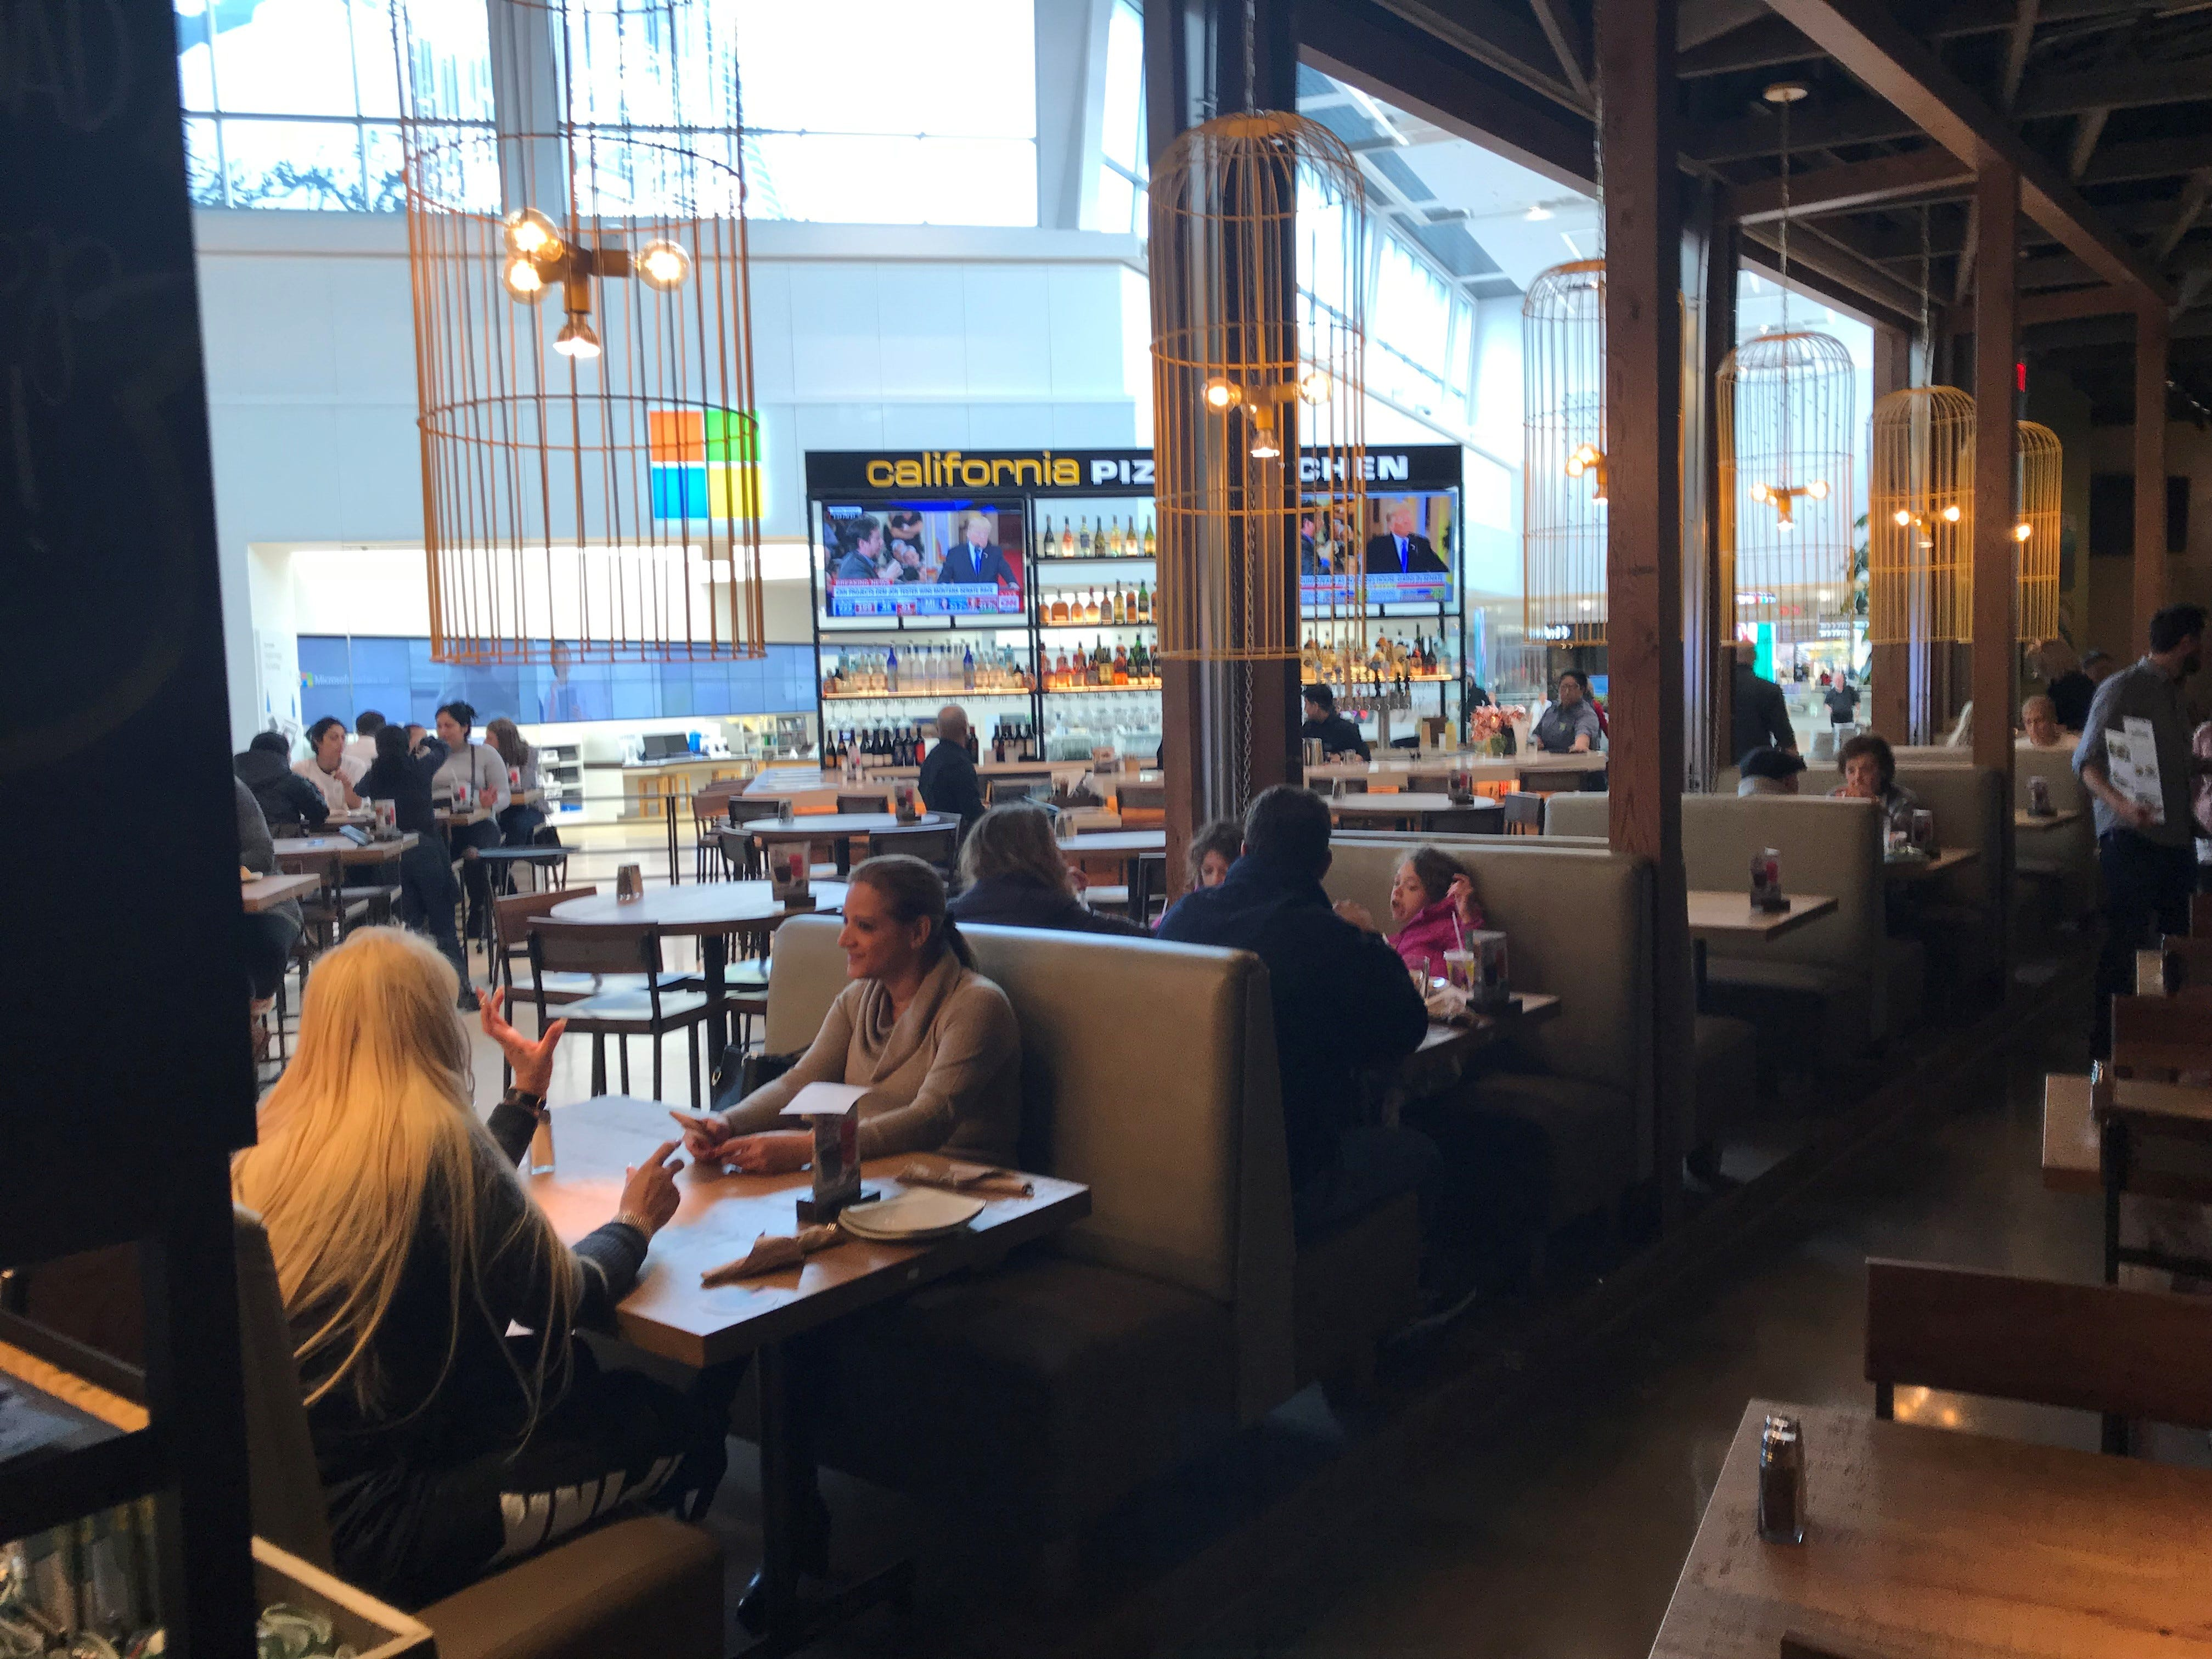 The new California Pizza Kitchen opens onto the mall common area.